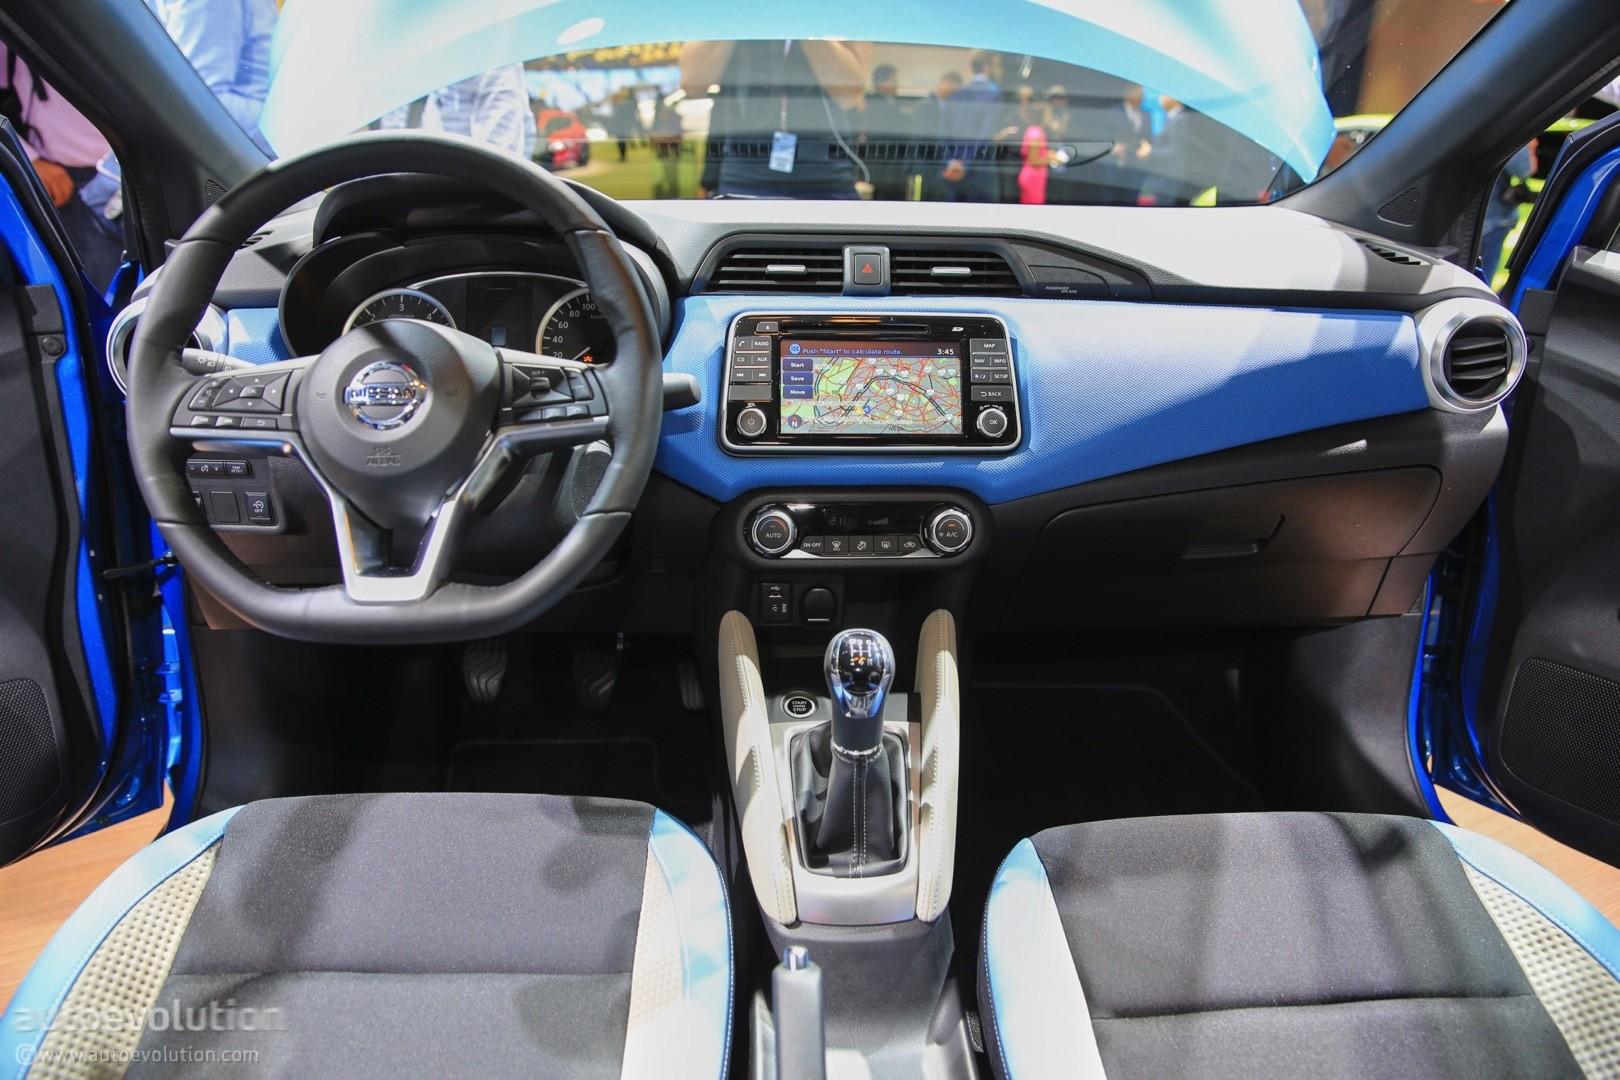 2017 Nissan Micra Price Revealed for UK Market: £11,995 ...